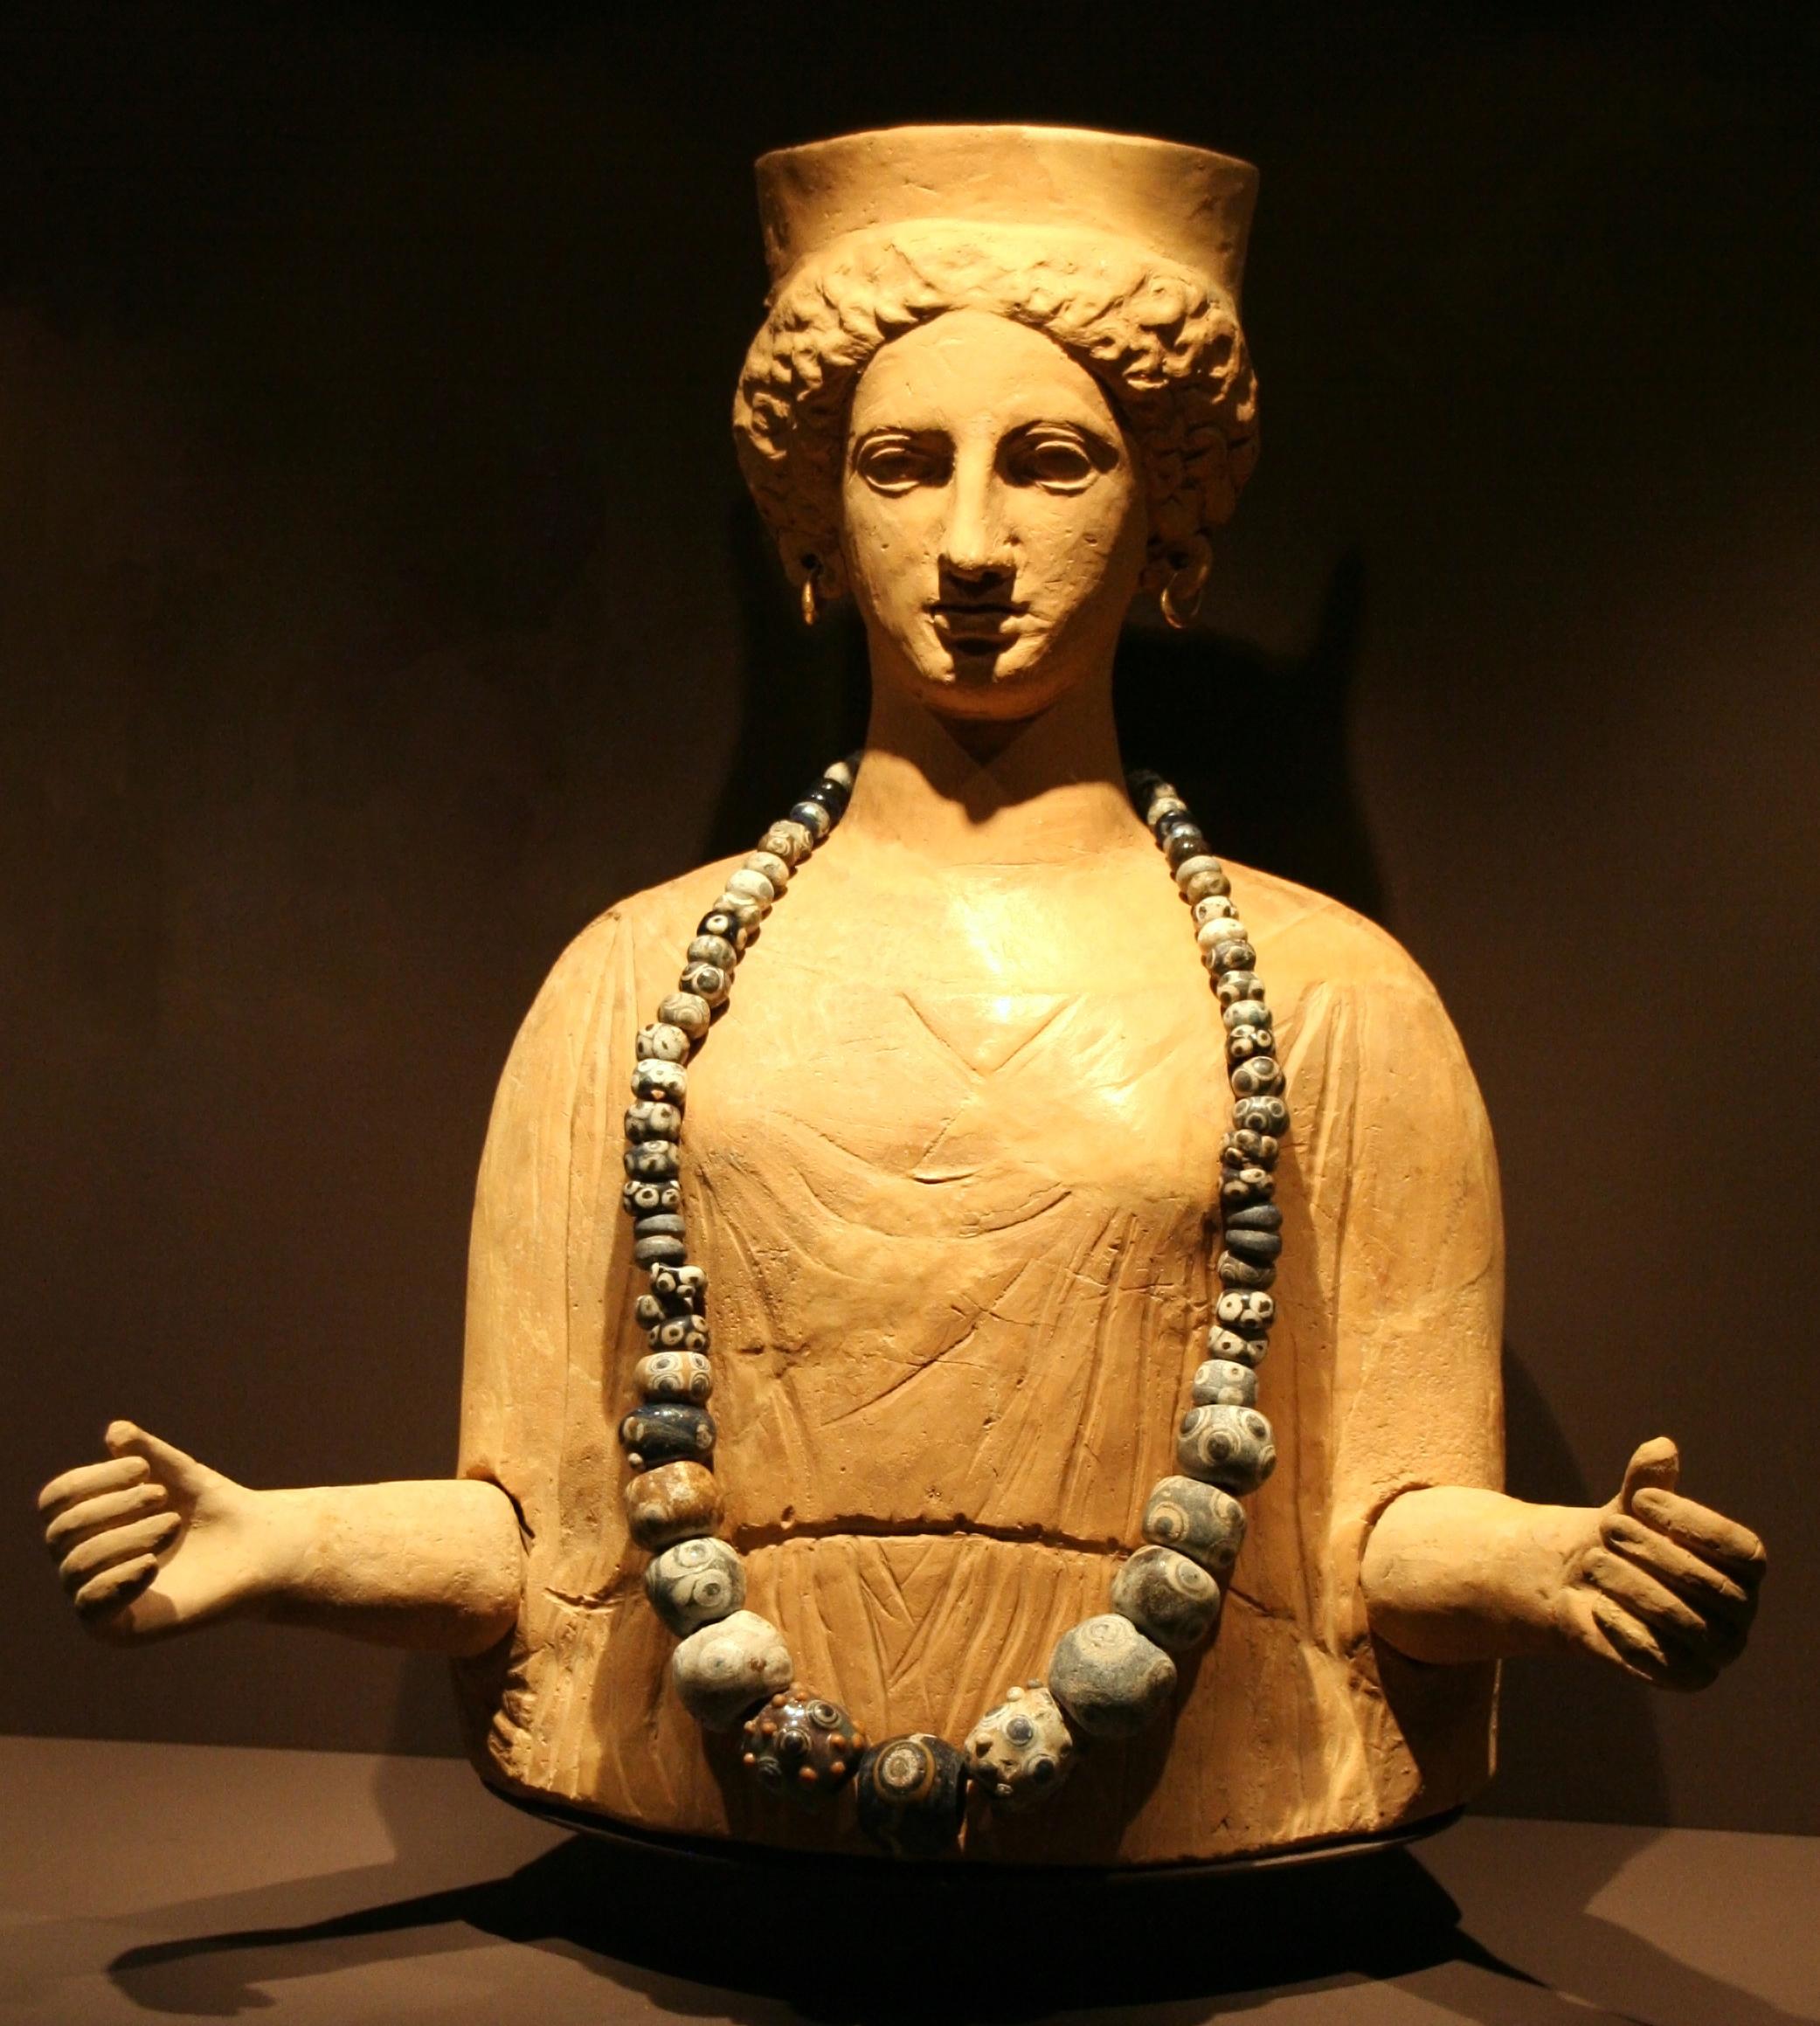 Da Tanit cartaginese alla dea Caelestis sull'arce Capitolina – Claudia Santi